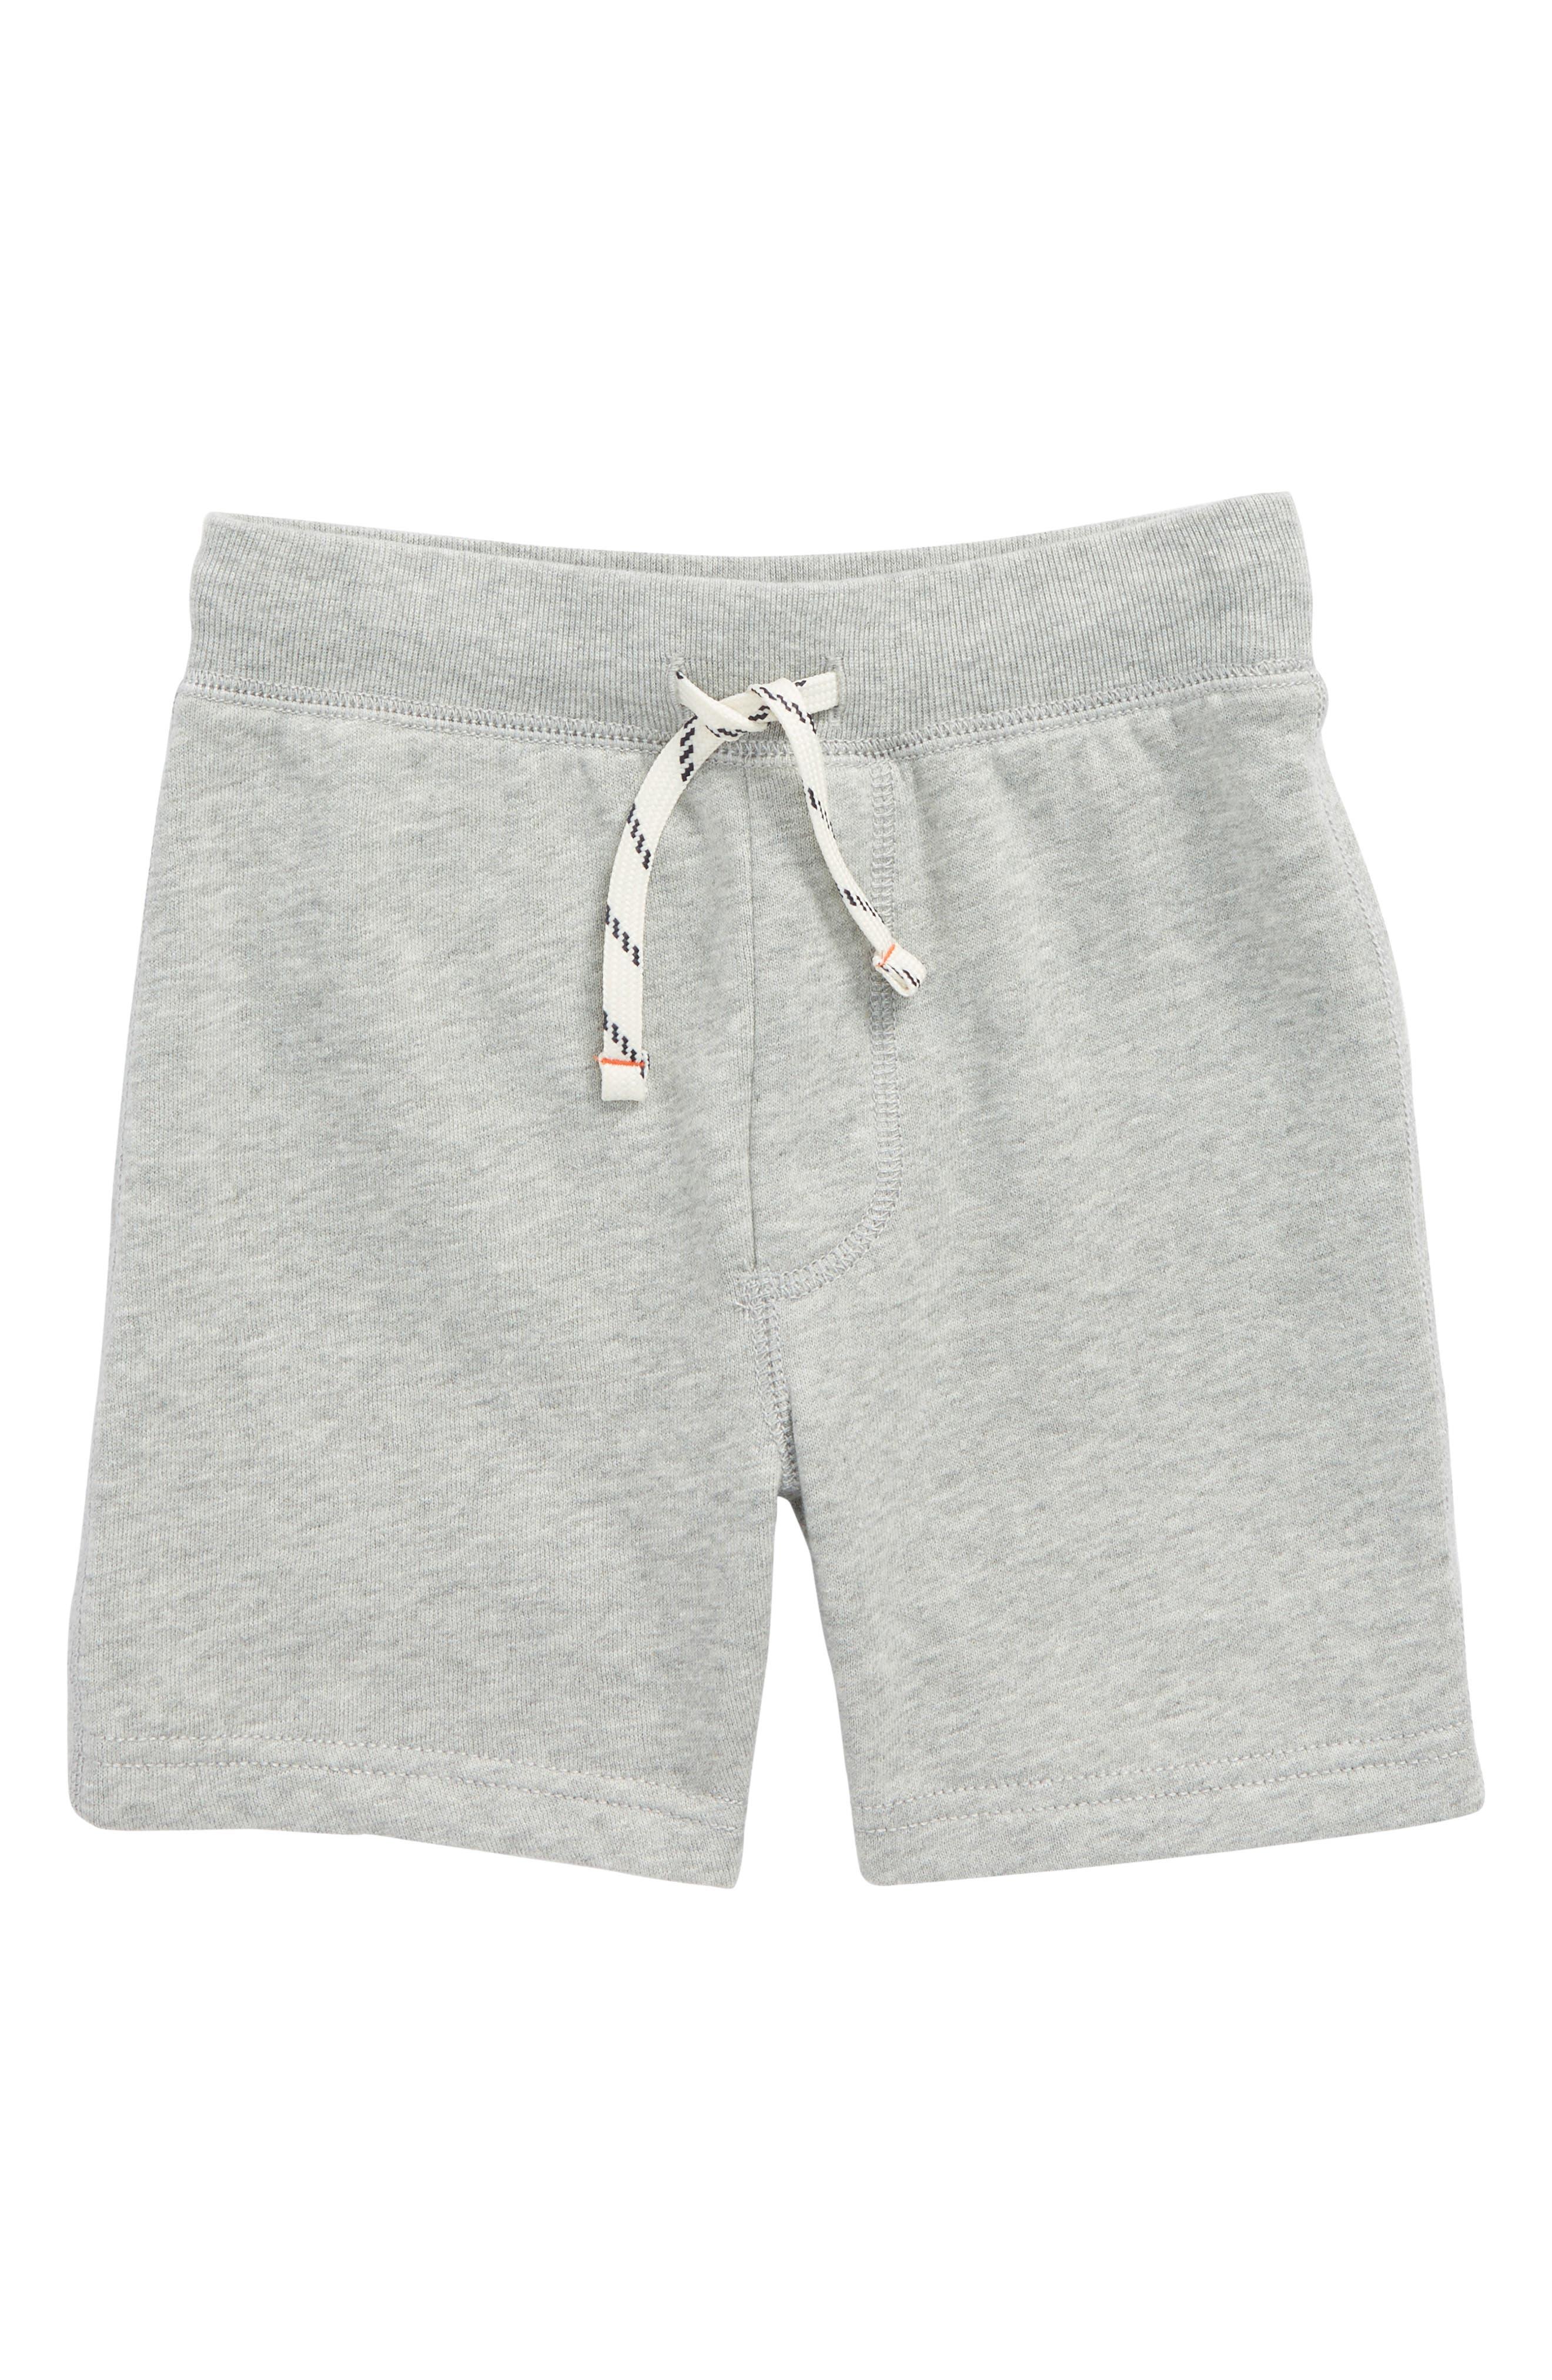 Boys Crewcuts By Jcrew Classic Sweat Shorts Size 16  Grey